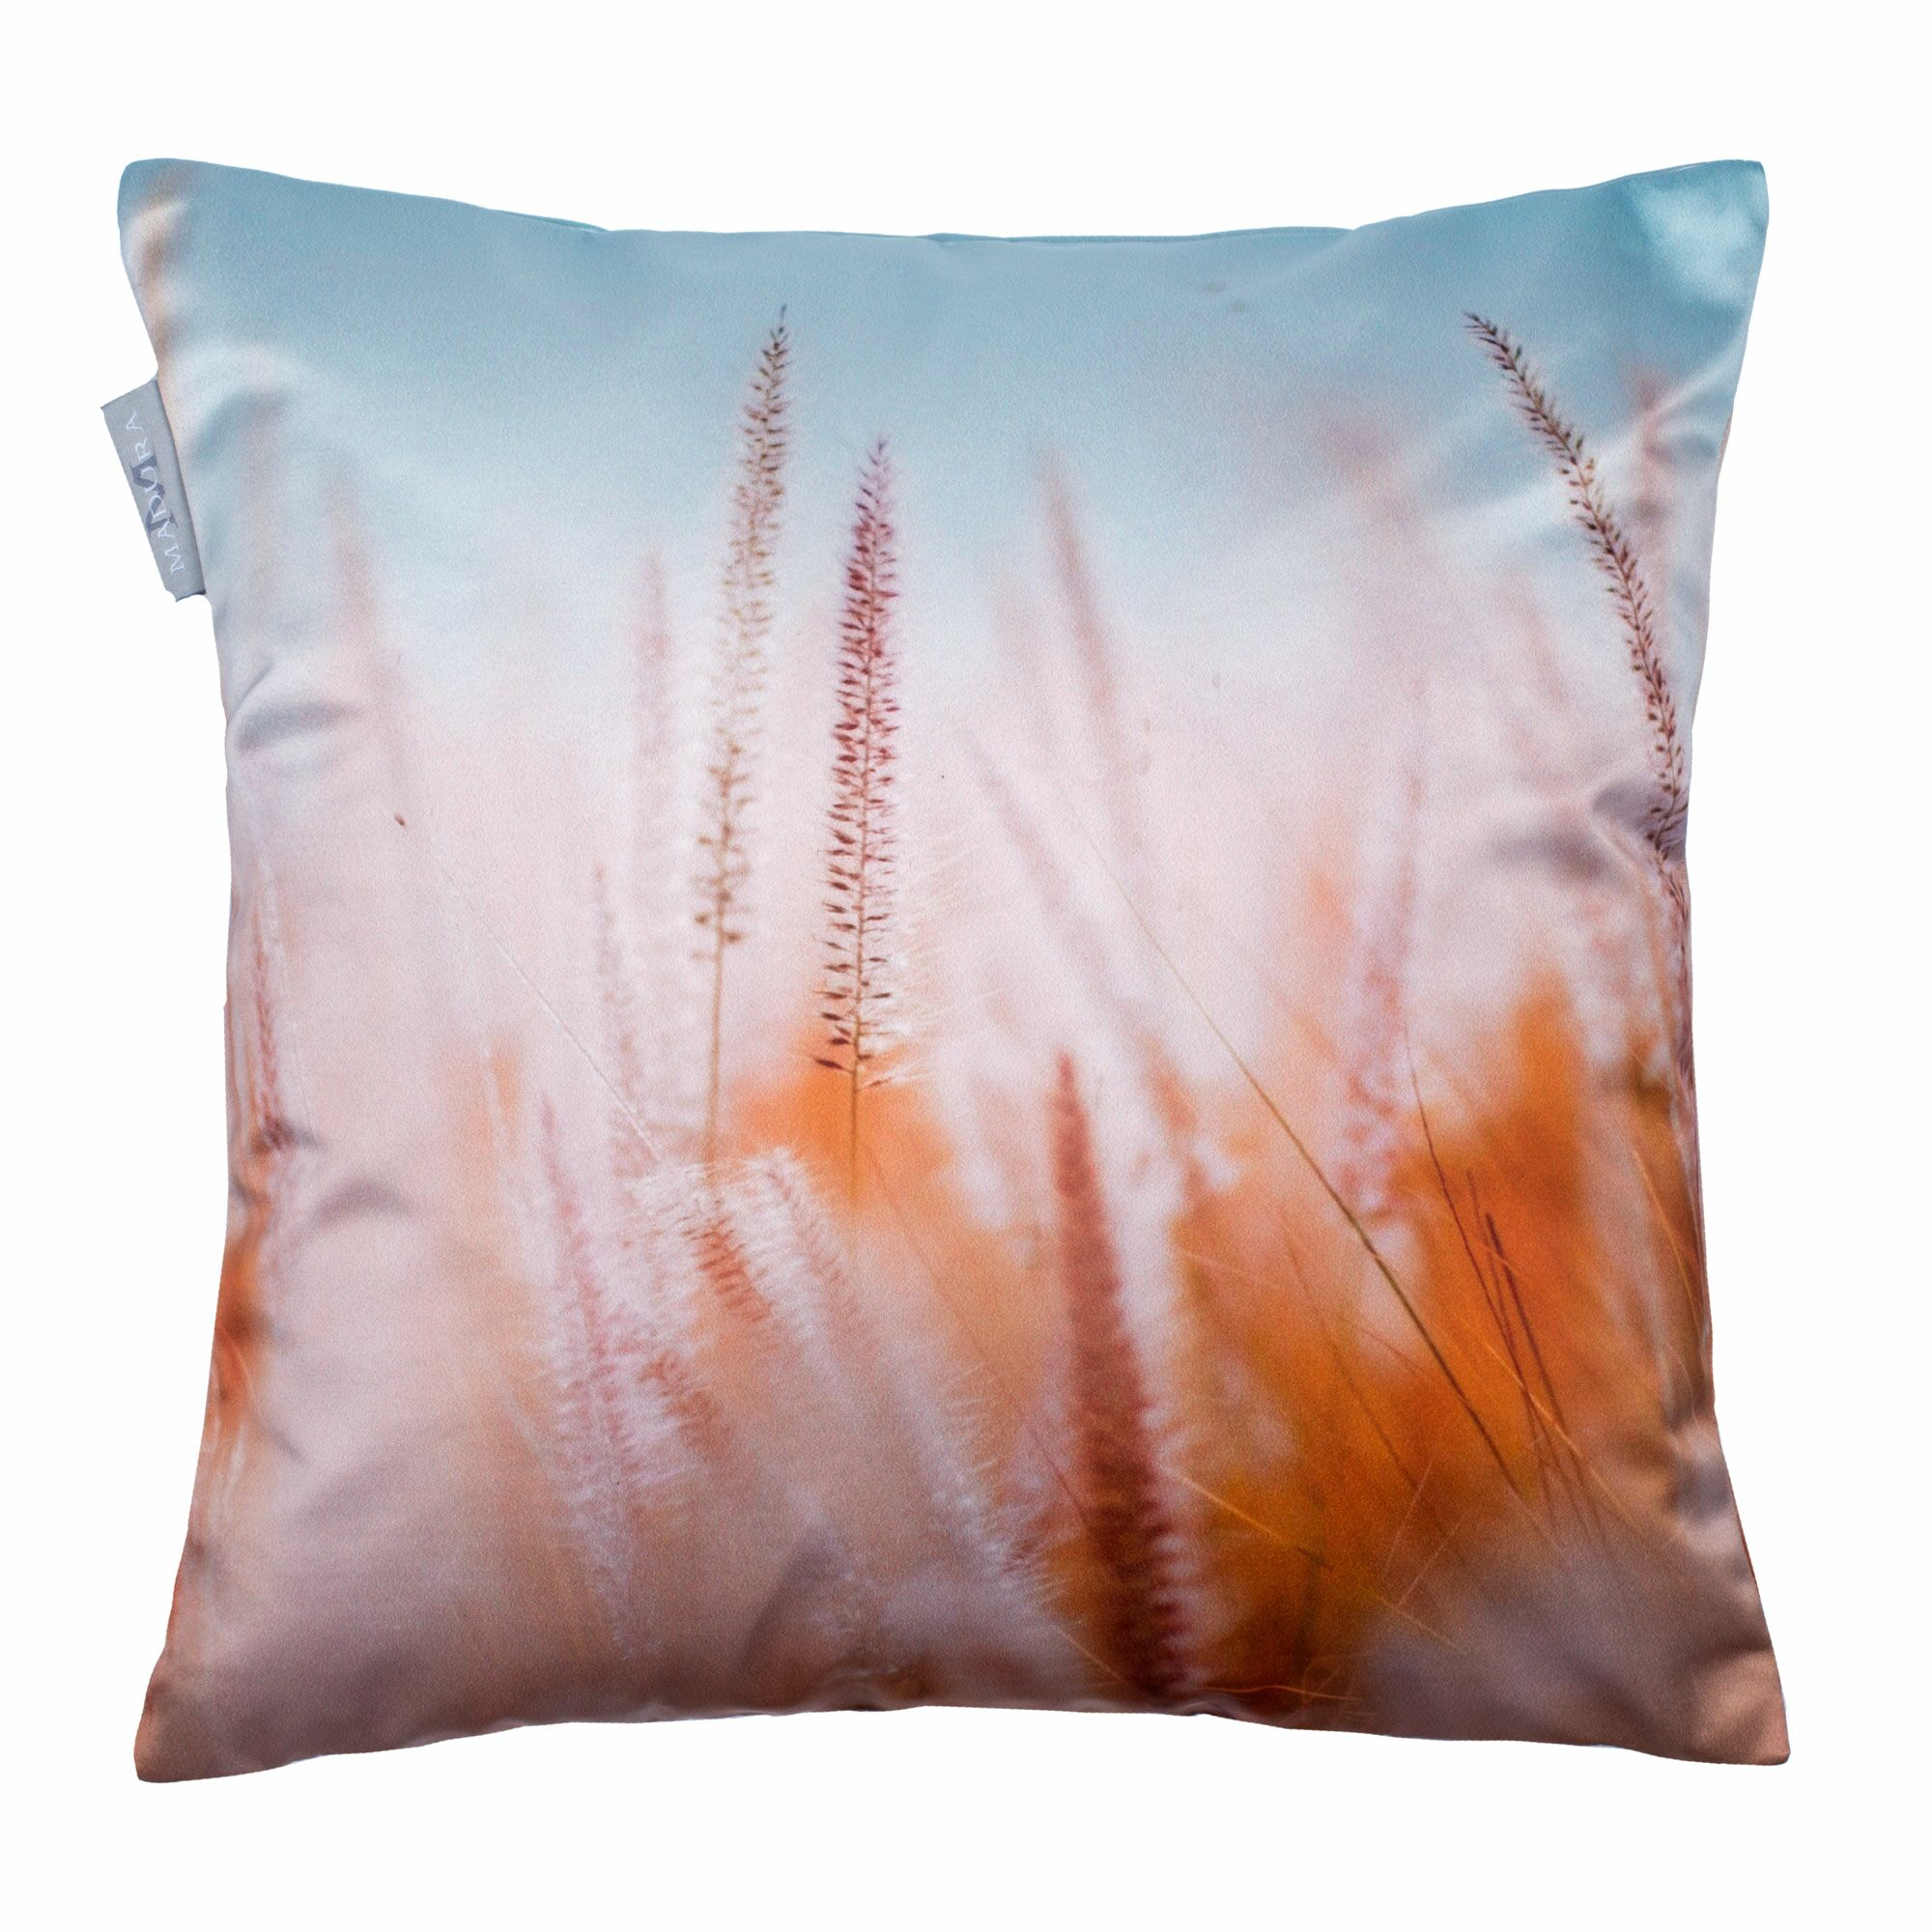 Fields Pillow Cover